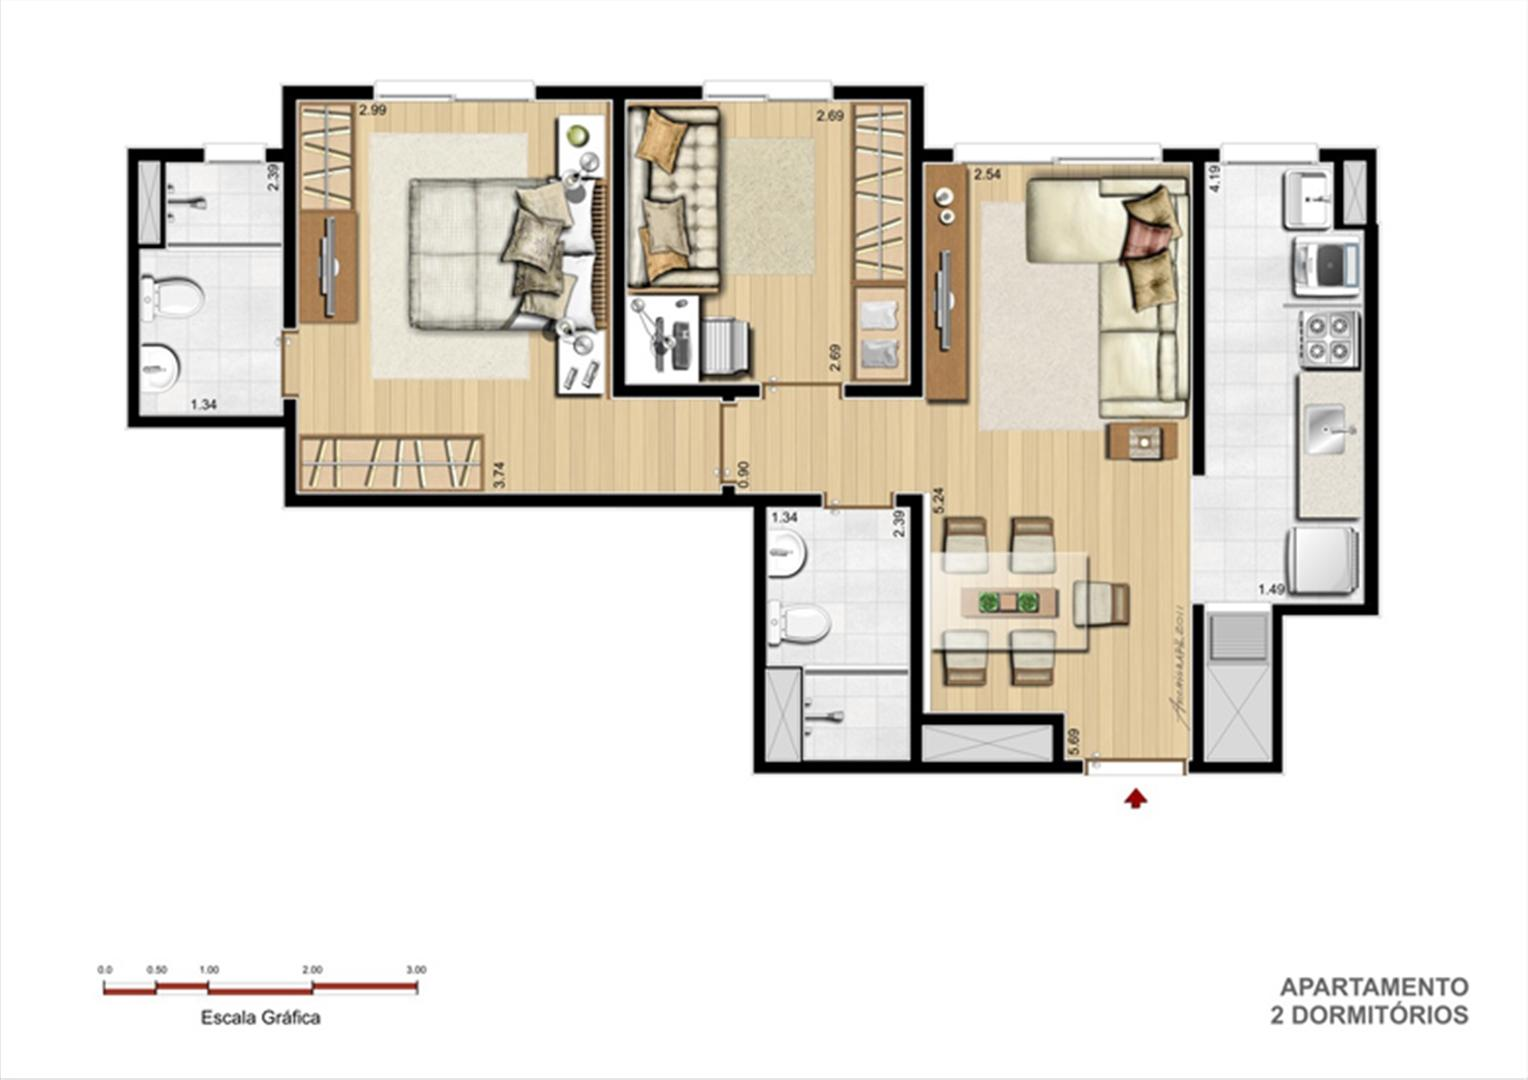 Terreo A - Tipo 2 dormitórios | Supera Condomínio Clube – Apartamento  próximo ao Zaffari Zona Sul - Porto Alegre - Rio Grande do Sul